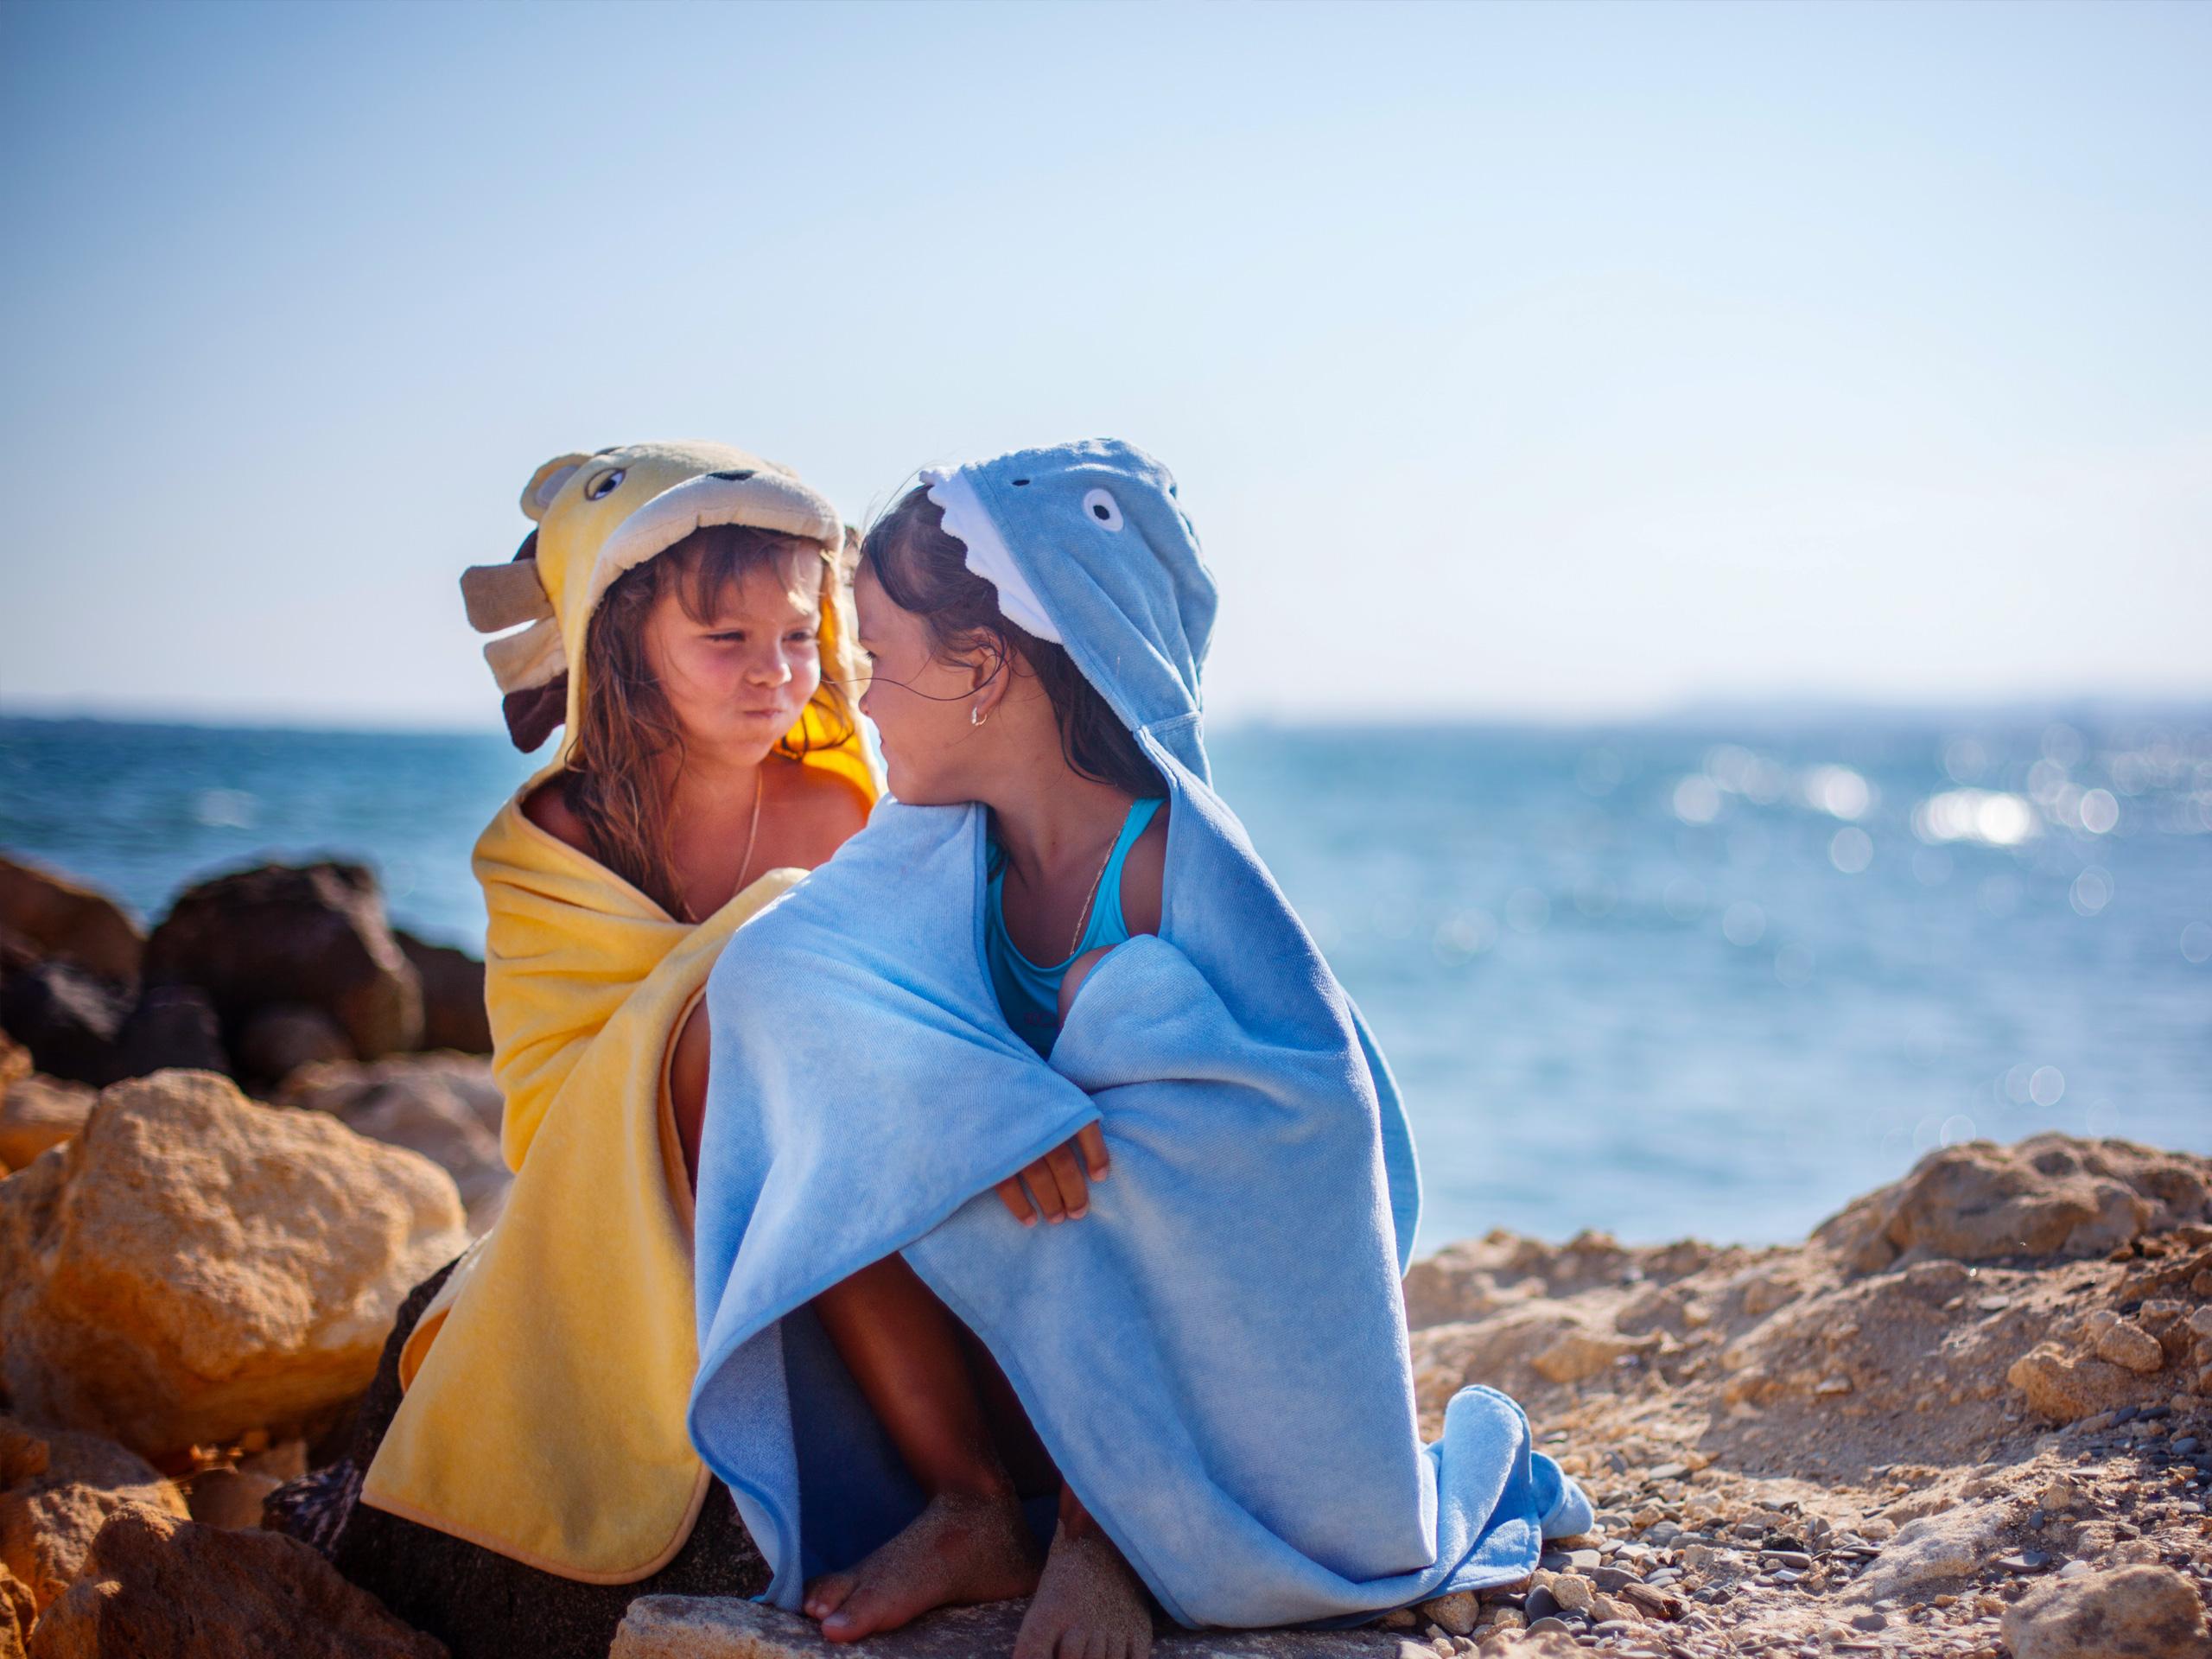 N//A Elu Eliott Lucas Skam France Microfiber Bath Towel Beach Towel Beach Blanket Quick Dry Towel for Travel Swim Pool Yoga Camping Gym